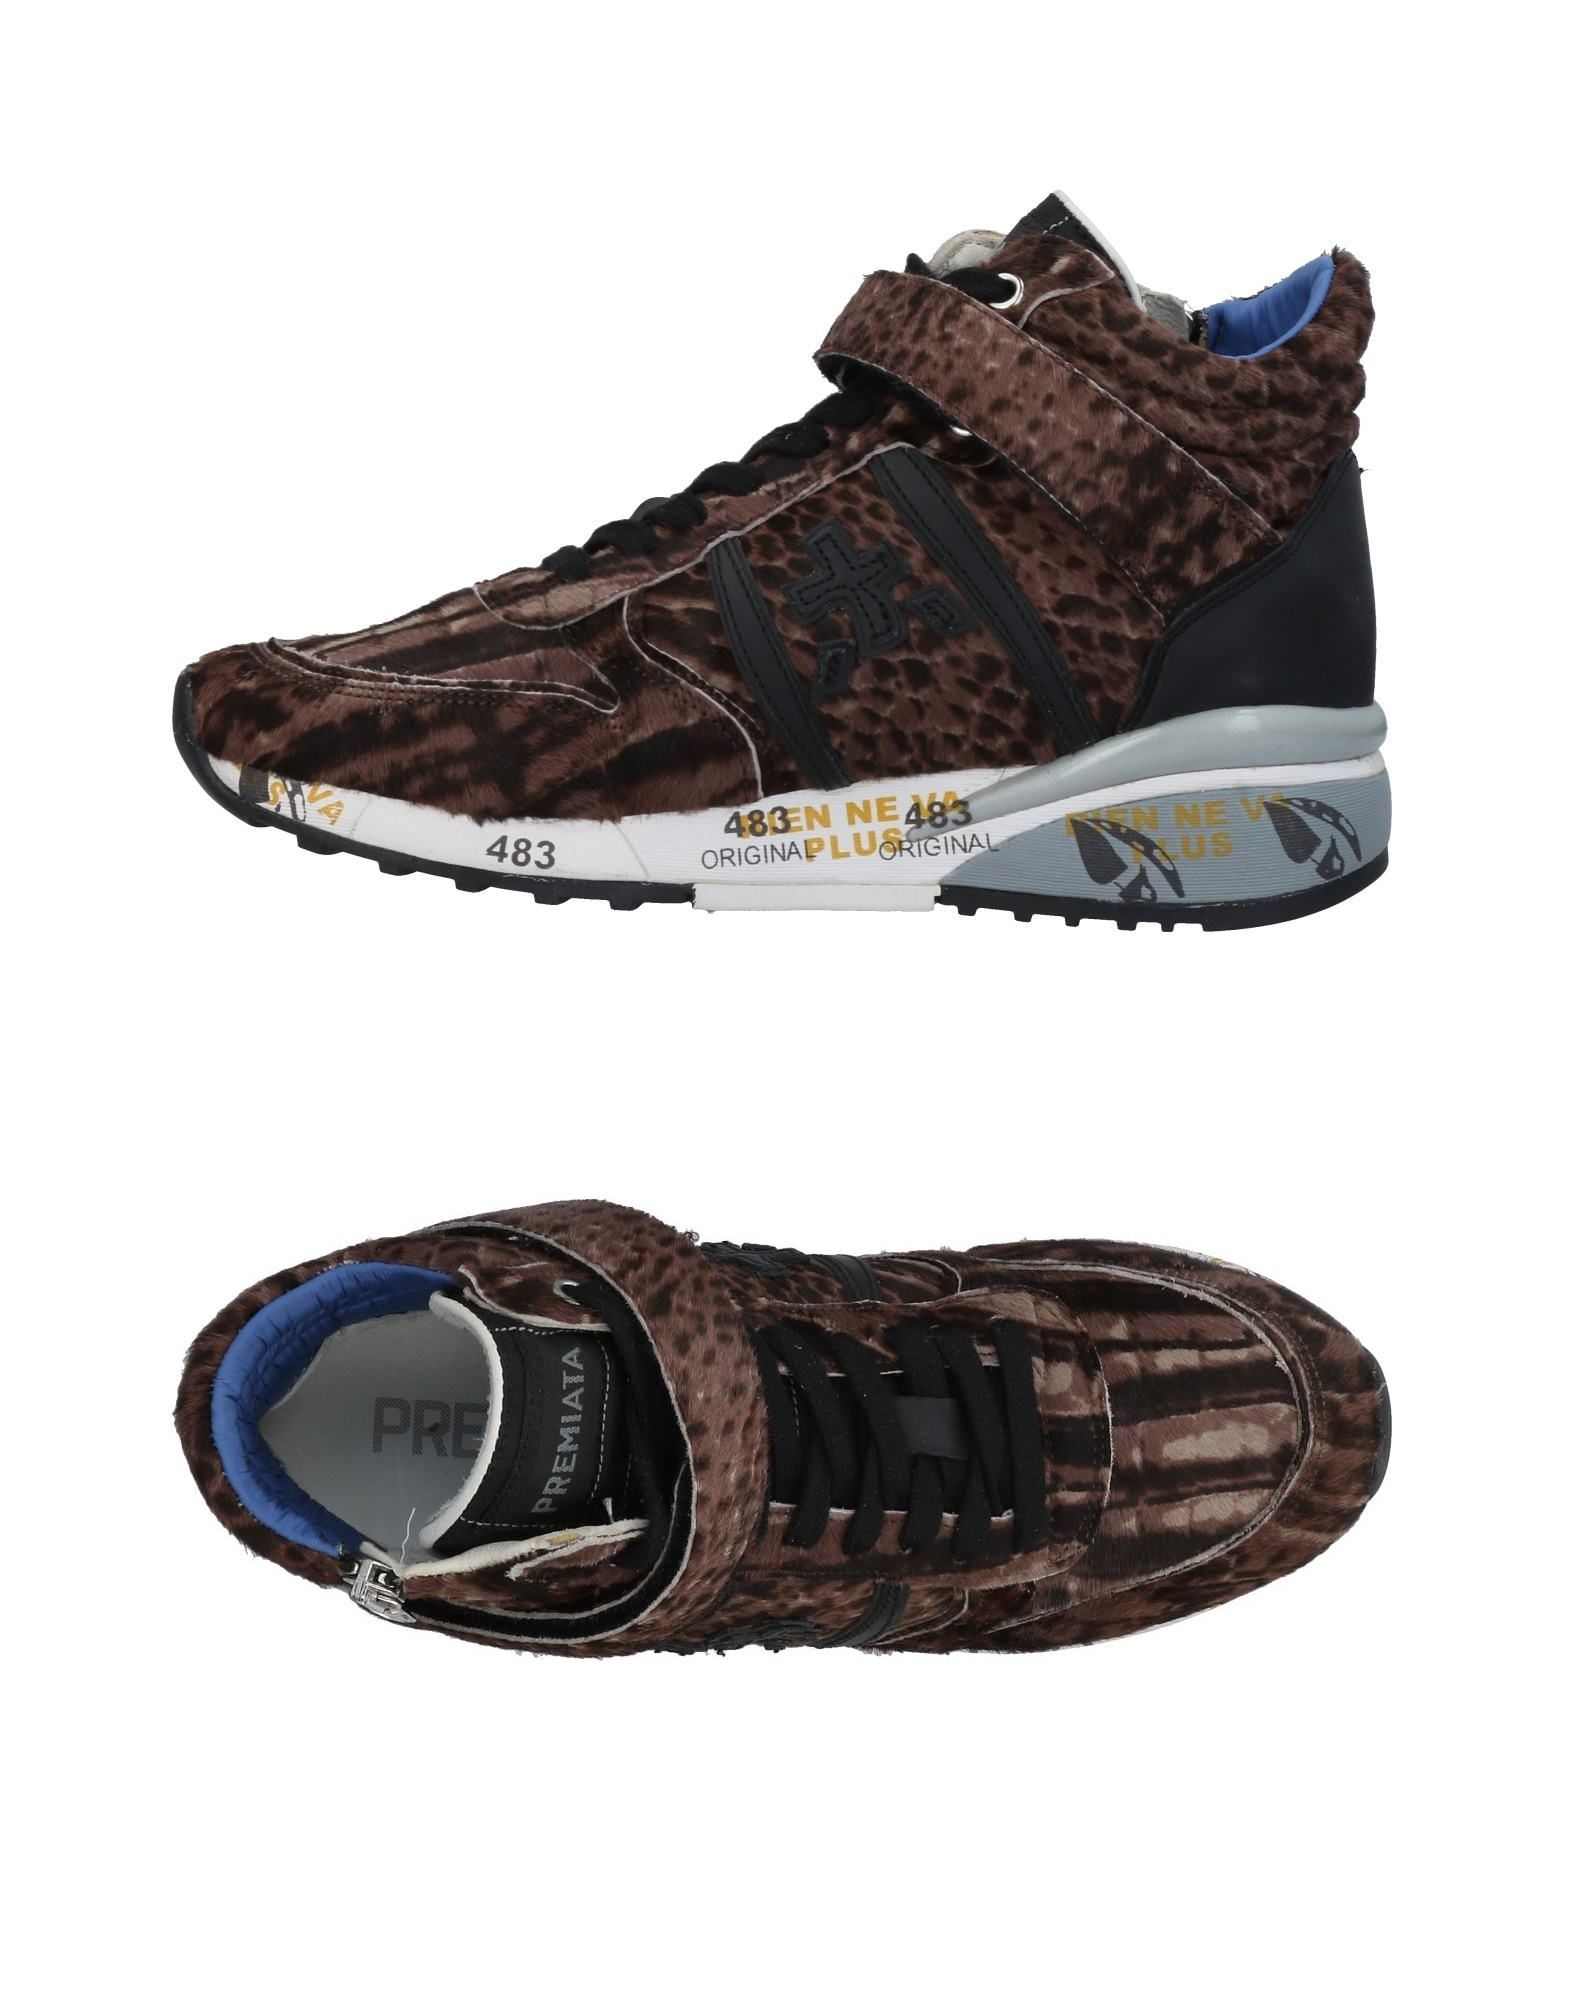 662a8294535 PREMIATA ΠΑΠΟΥΤΣΙΑ Χαμηλά sneakers, Γυναικεία sneakers, ΓΥΝΑΙΚΑ ...